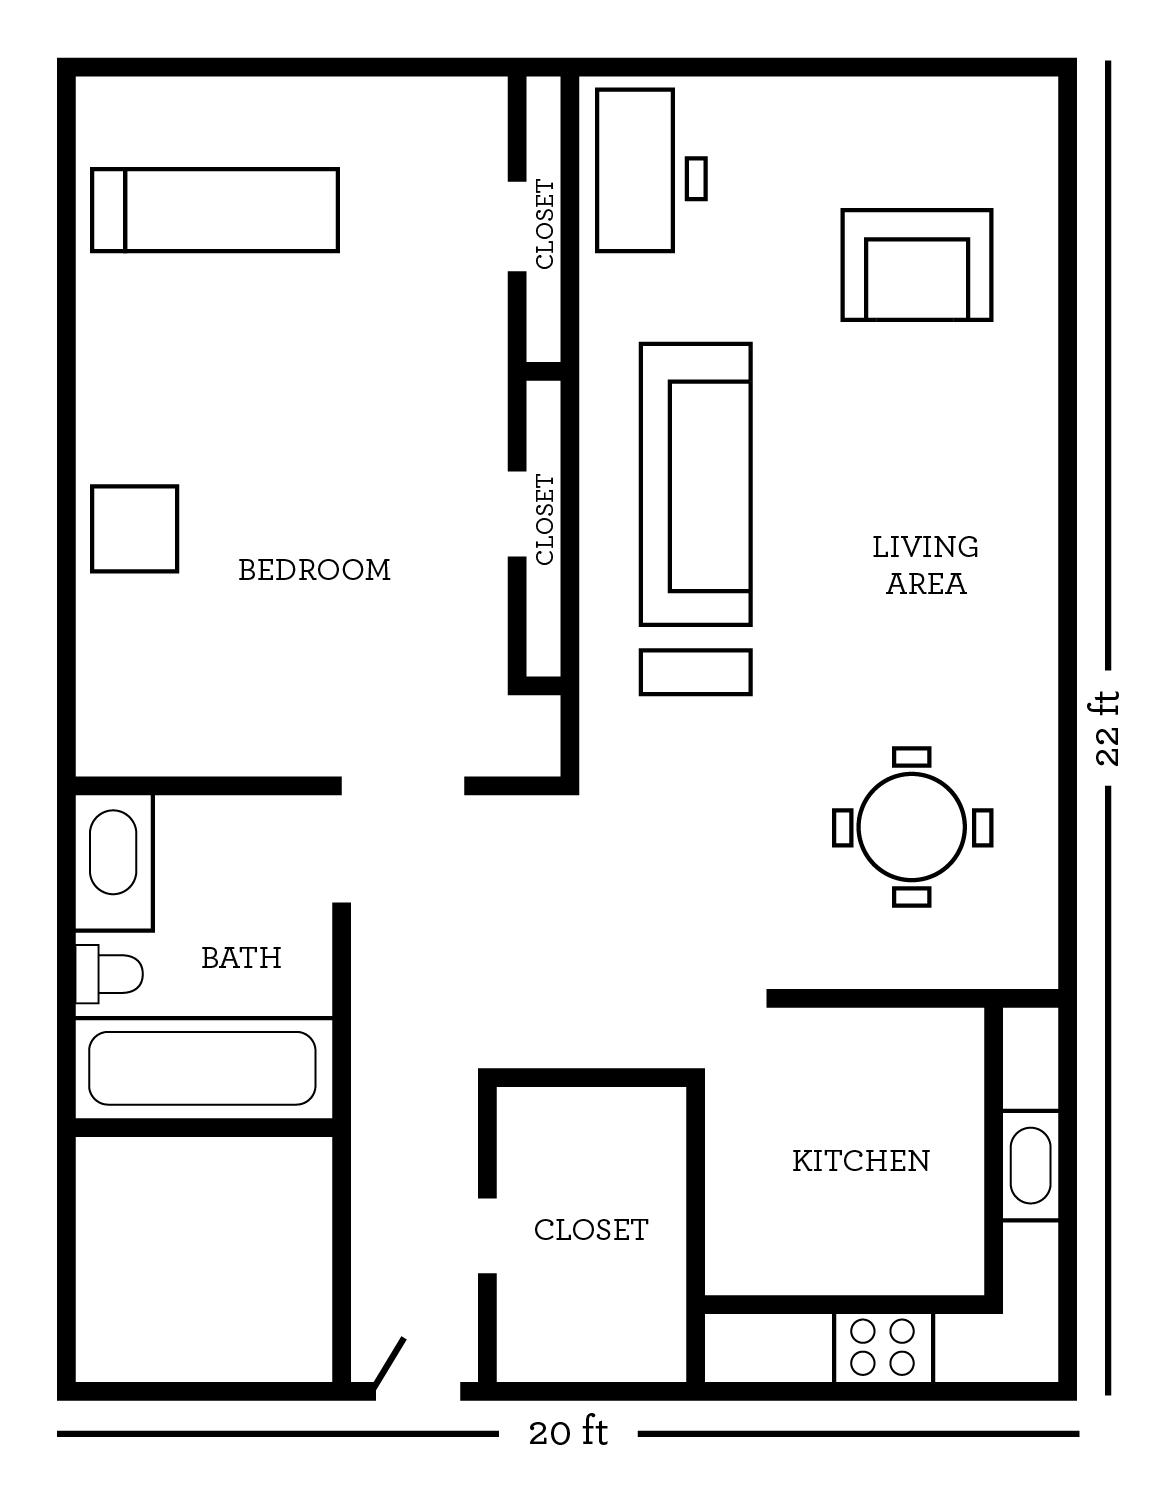 uab - student affairs - housing